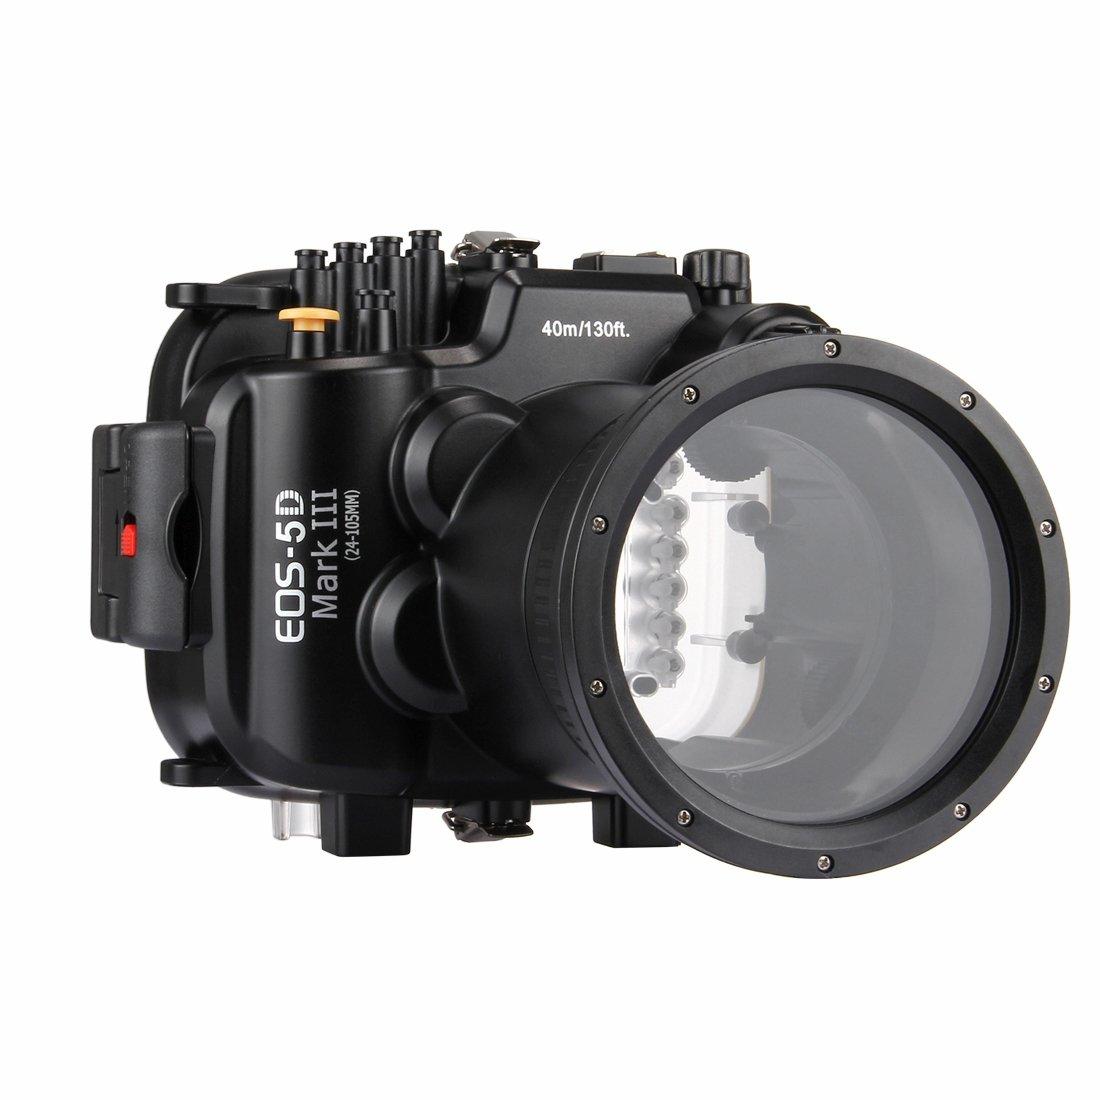 PULUZ 40m水中深度ダイビングケースCanon EOS-5D Mark III防水カメラハウジング(EF 24-105mm f / 4L IS II USM)   B07QML7N62